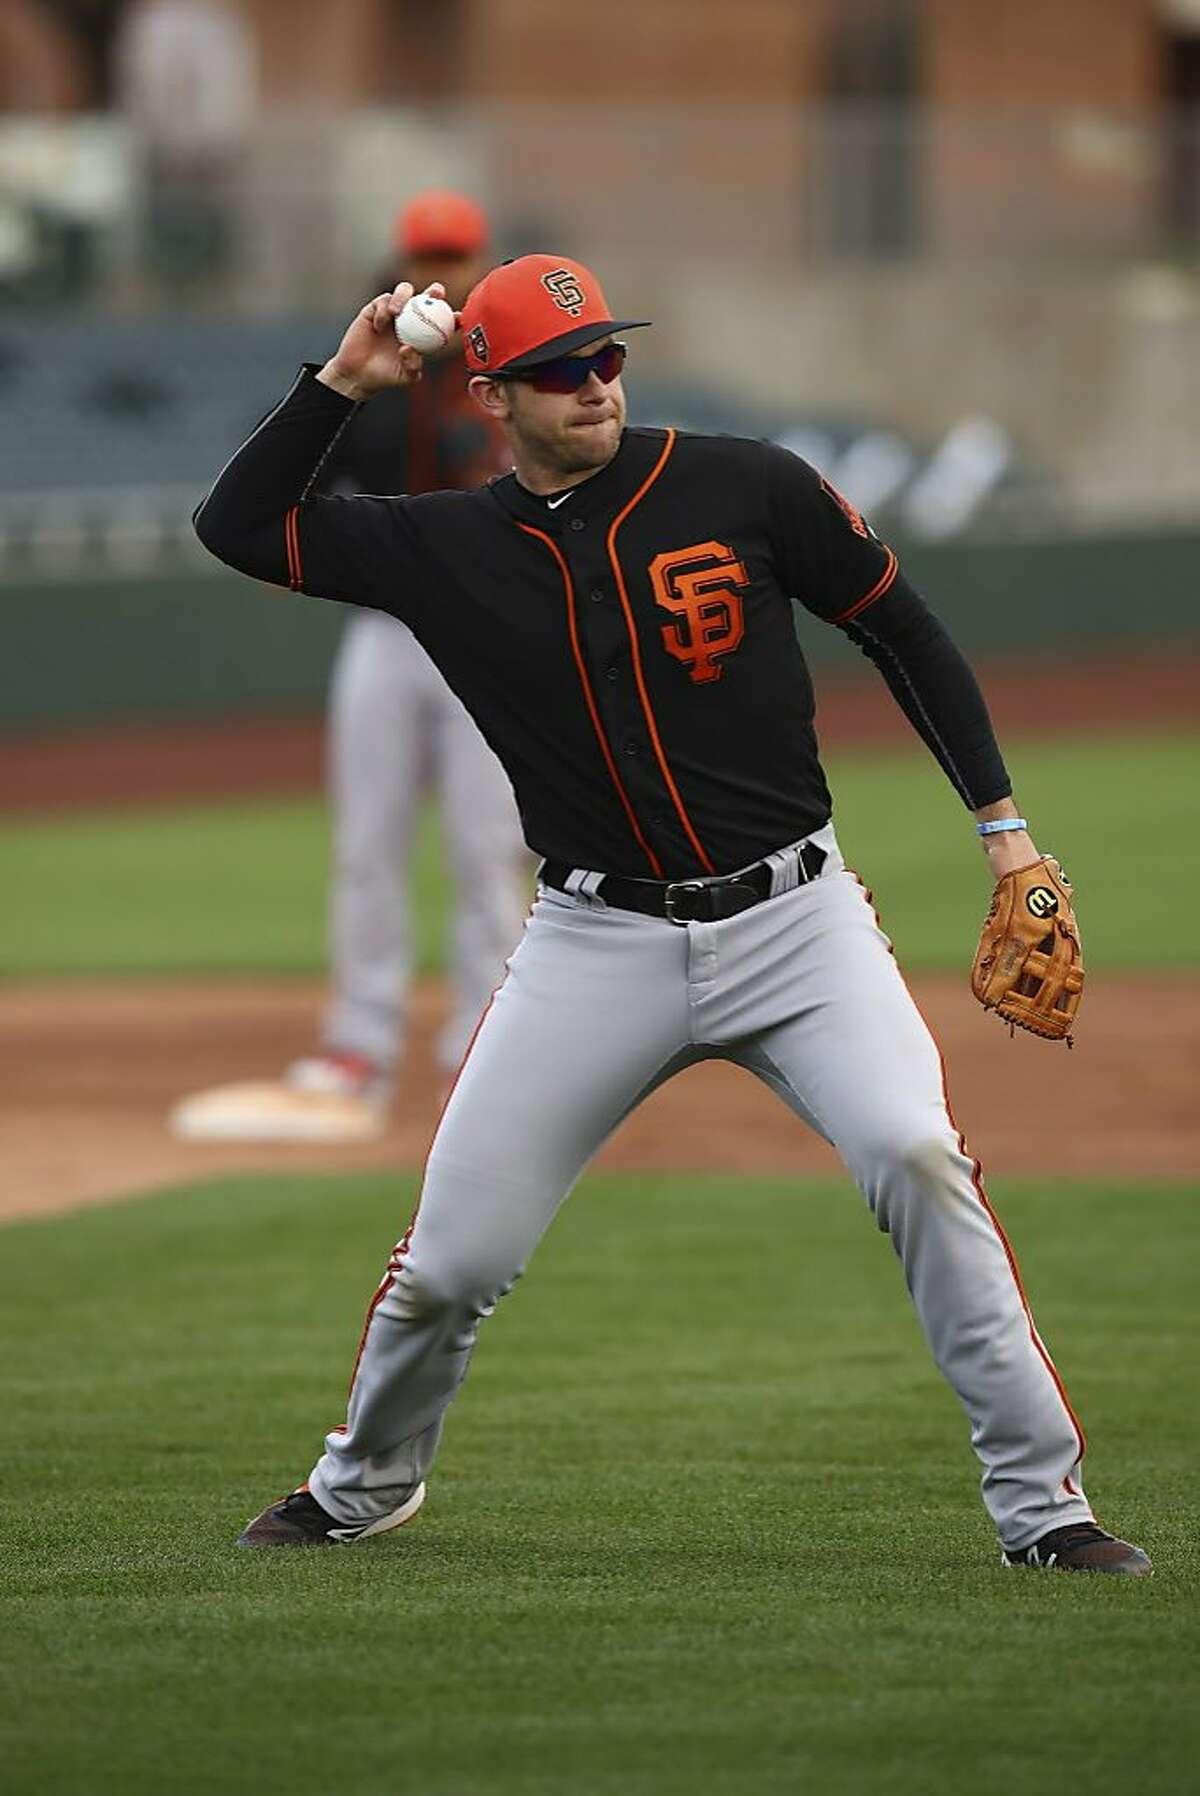 San Francisco Giants' Evan Longoria during a spring training baseball practice on Monday, Feb. 19, 2018 in Scottsdale, Ariz.